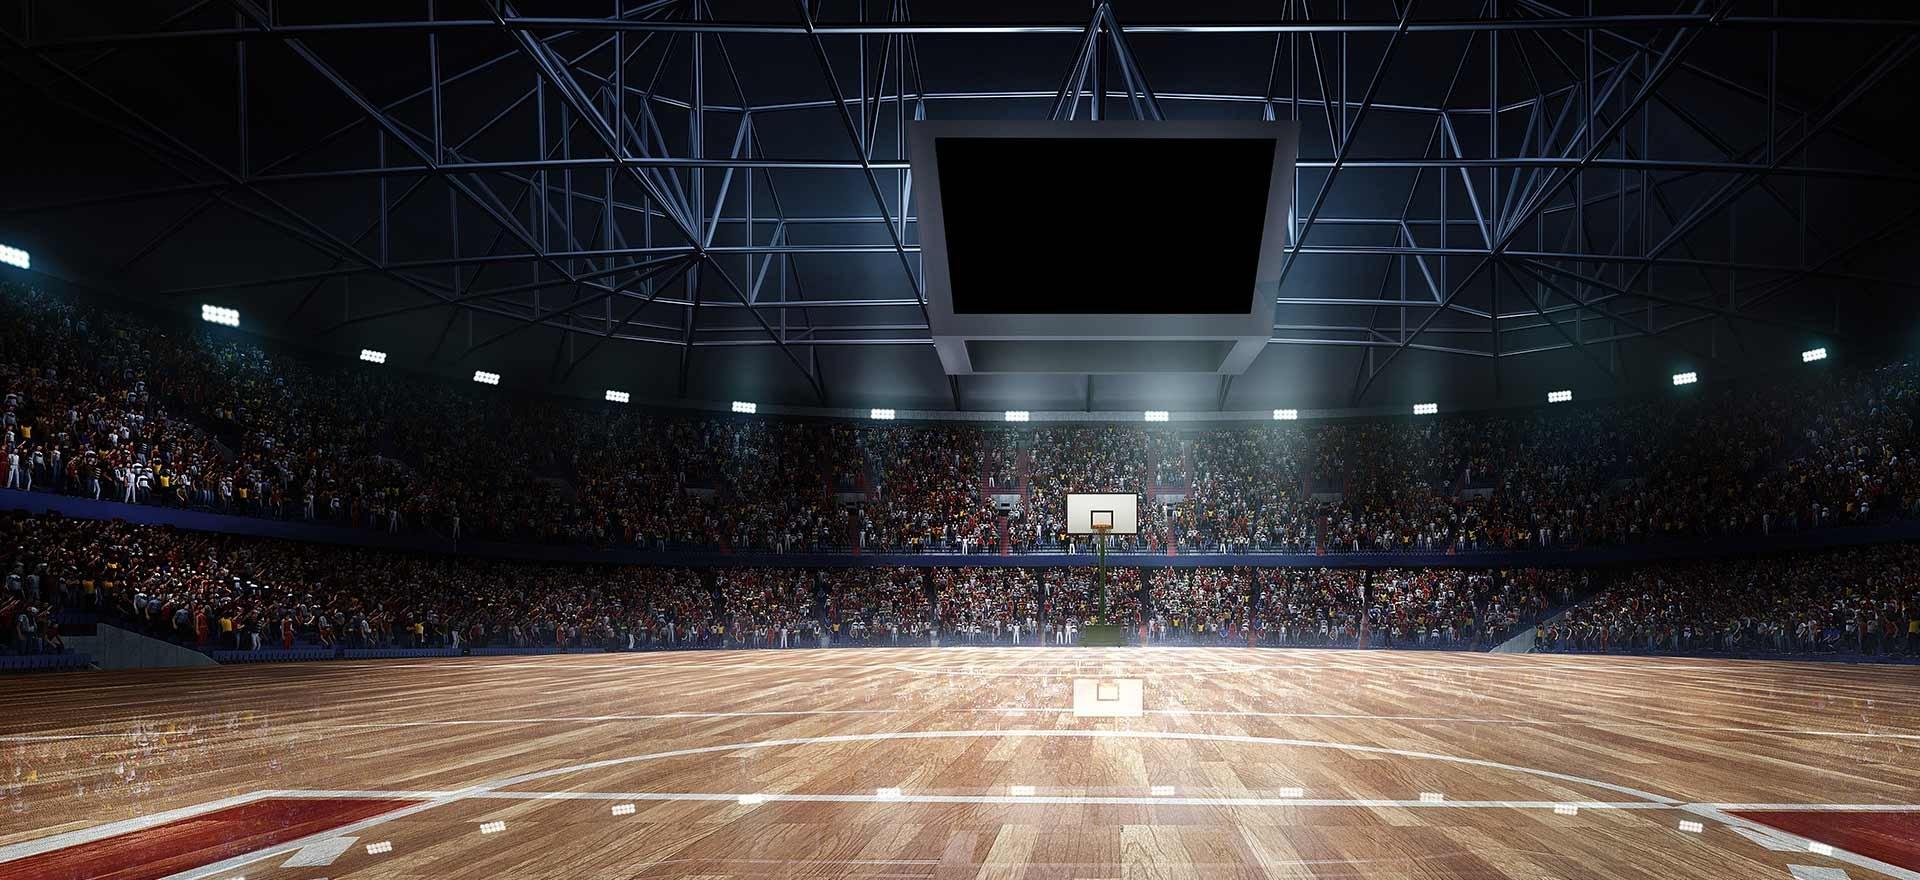 College Men's Basketball Championship Rings